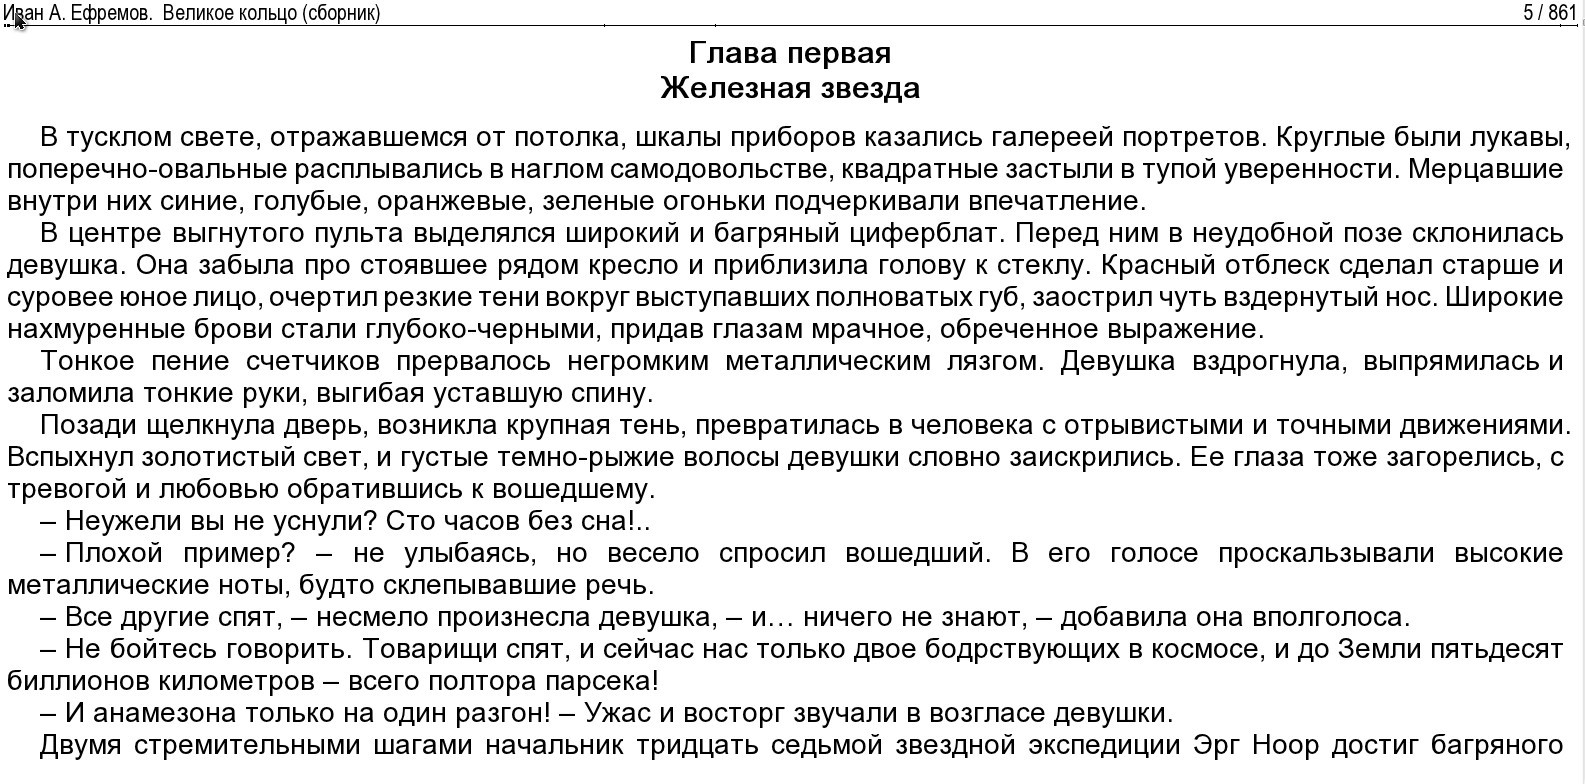 http://i6.imageban.ru/out/2014/08/11/441014550aa486ee537a4589b66635e0.jpg